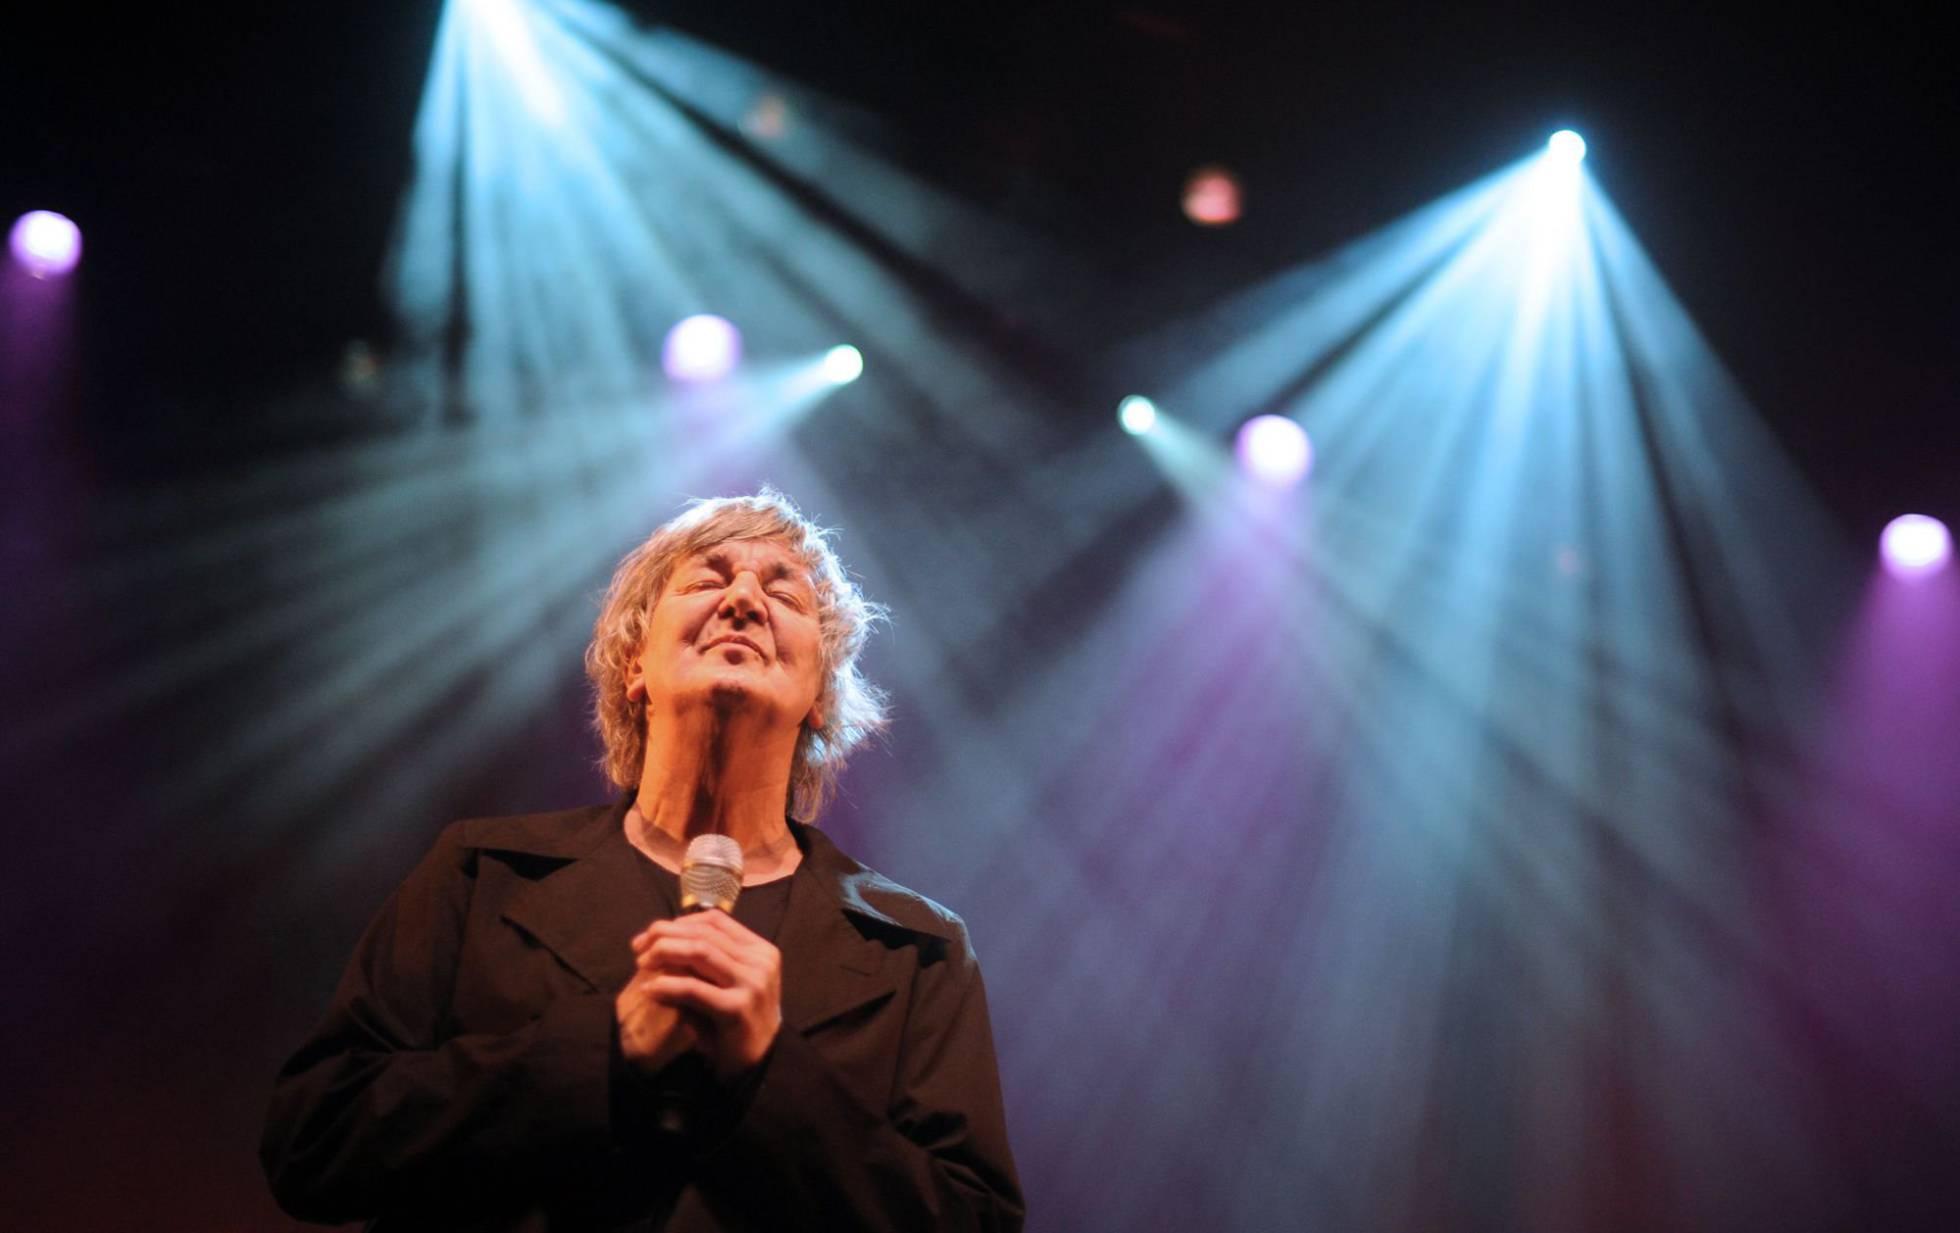 Muere Jacques Higelin, uno de los pioneros del rock francés